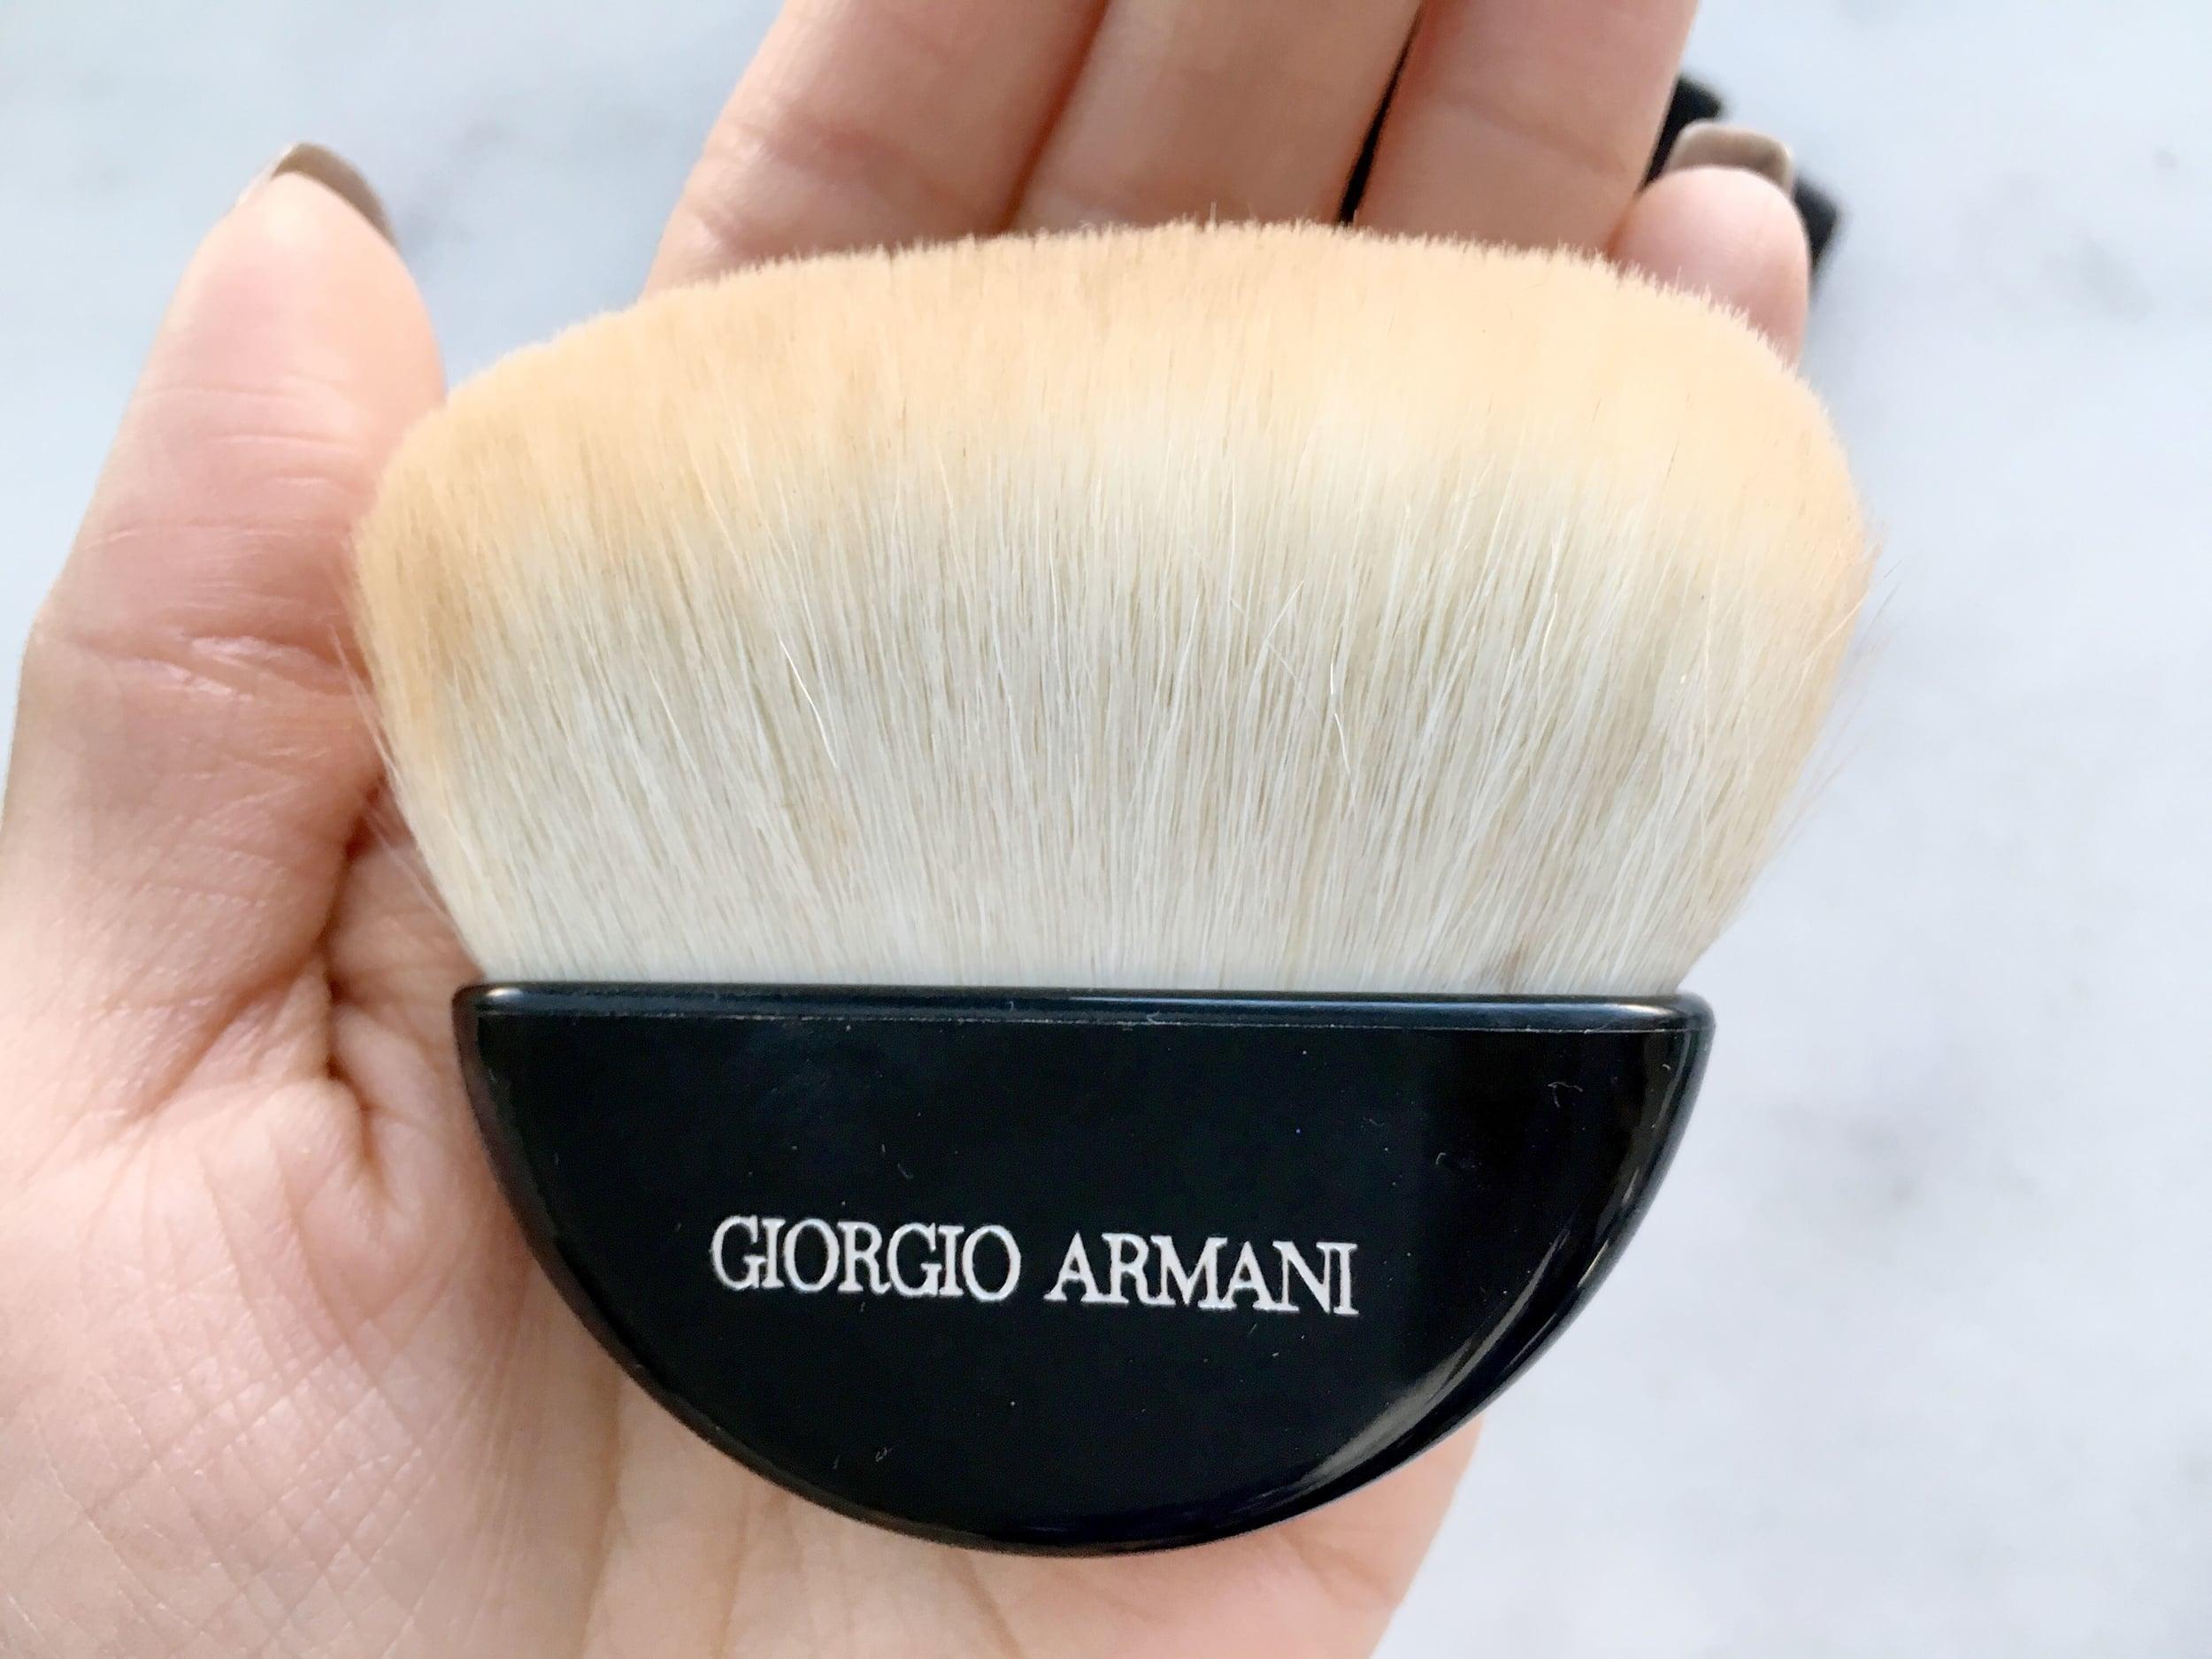 suositut kaupat tilata netistä monia muodikkaita Giorgio Armani Maestro Sculpting Powder Brush ♡ — XOXO, JOYCE